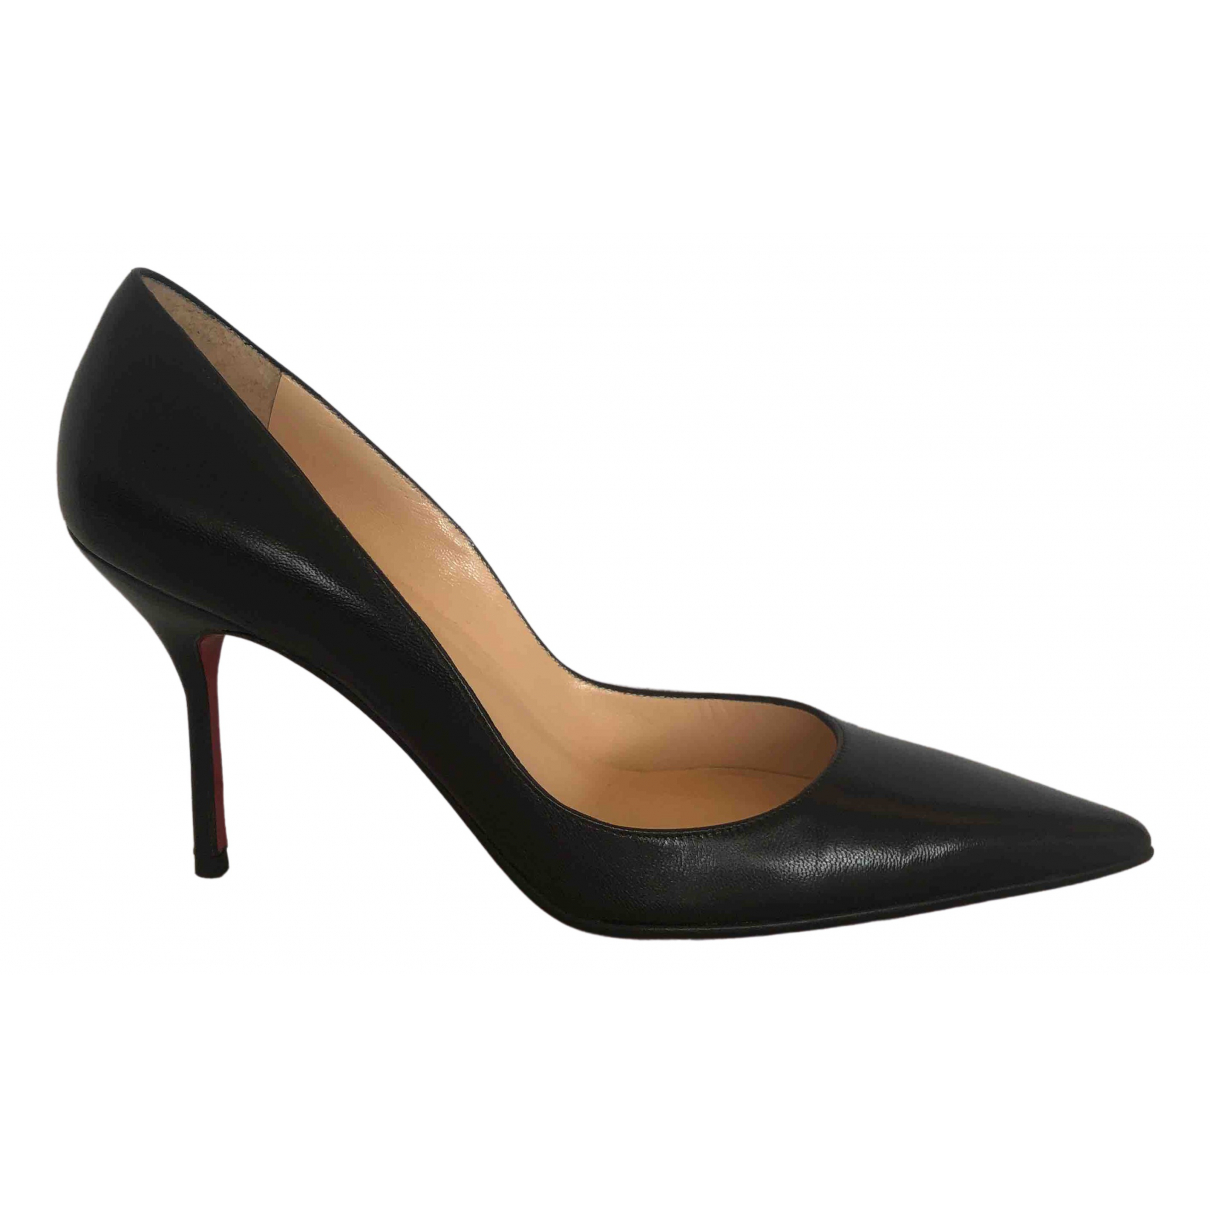 Christian Louboutin Simple pump Black Leather Heels for Women 37.5 EU